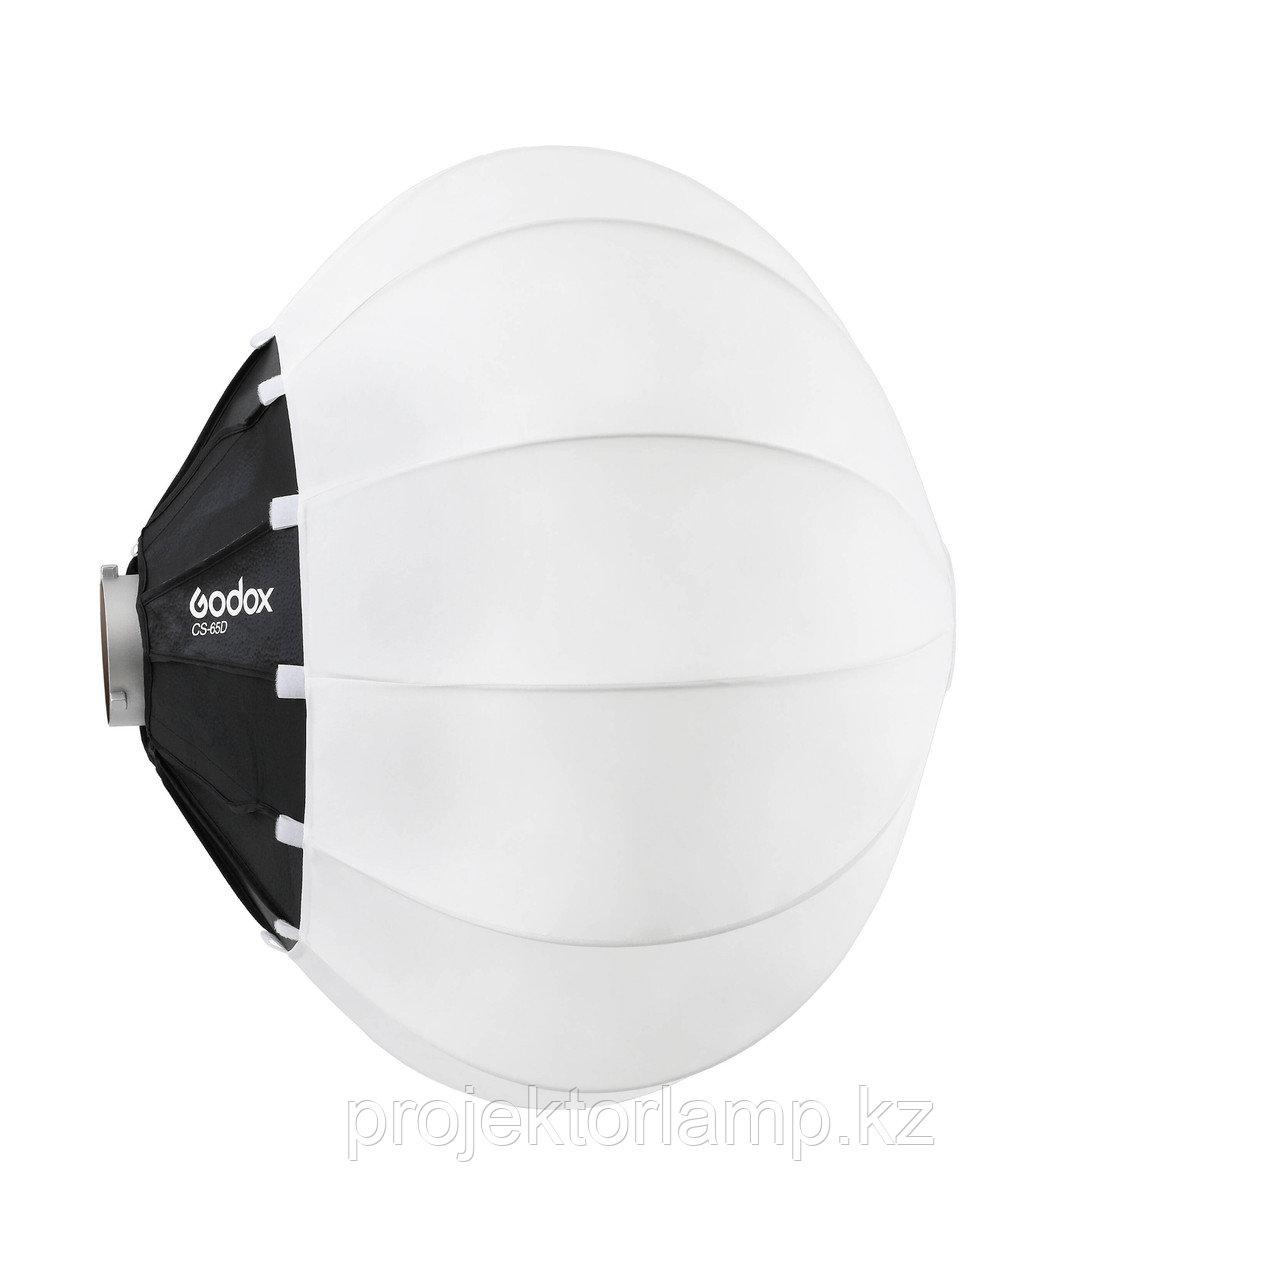 Софтбокс сферический Godox CS65D (65см)